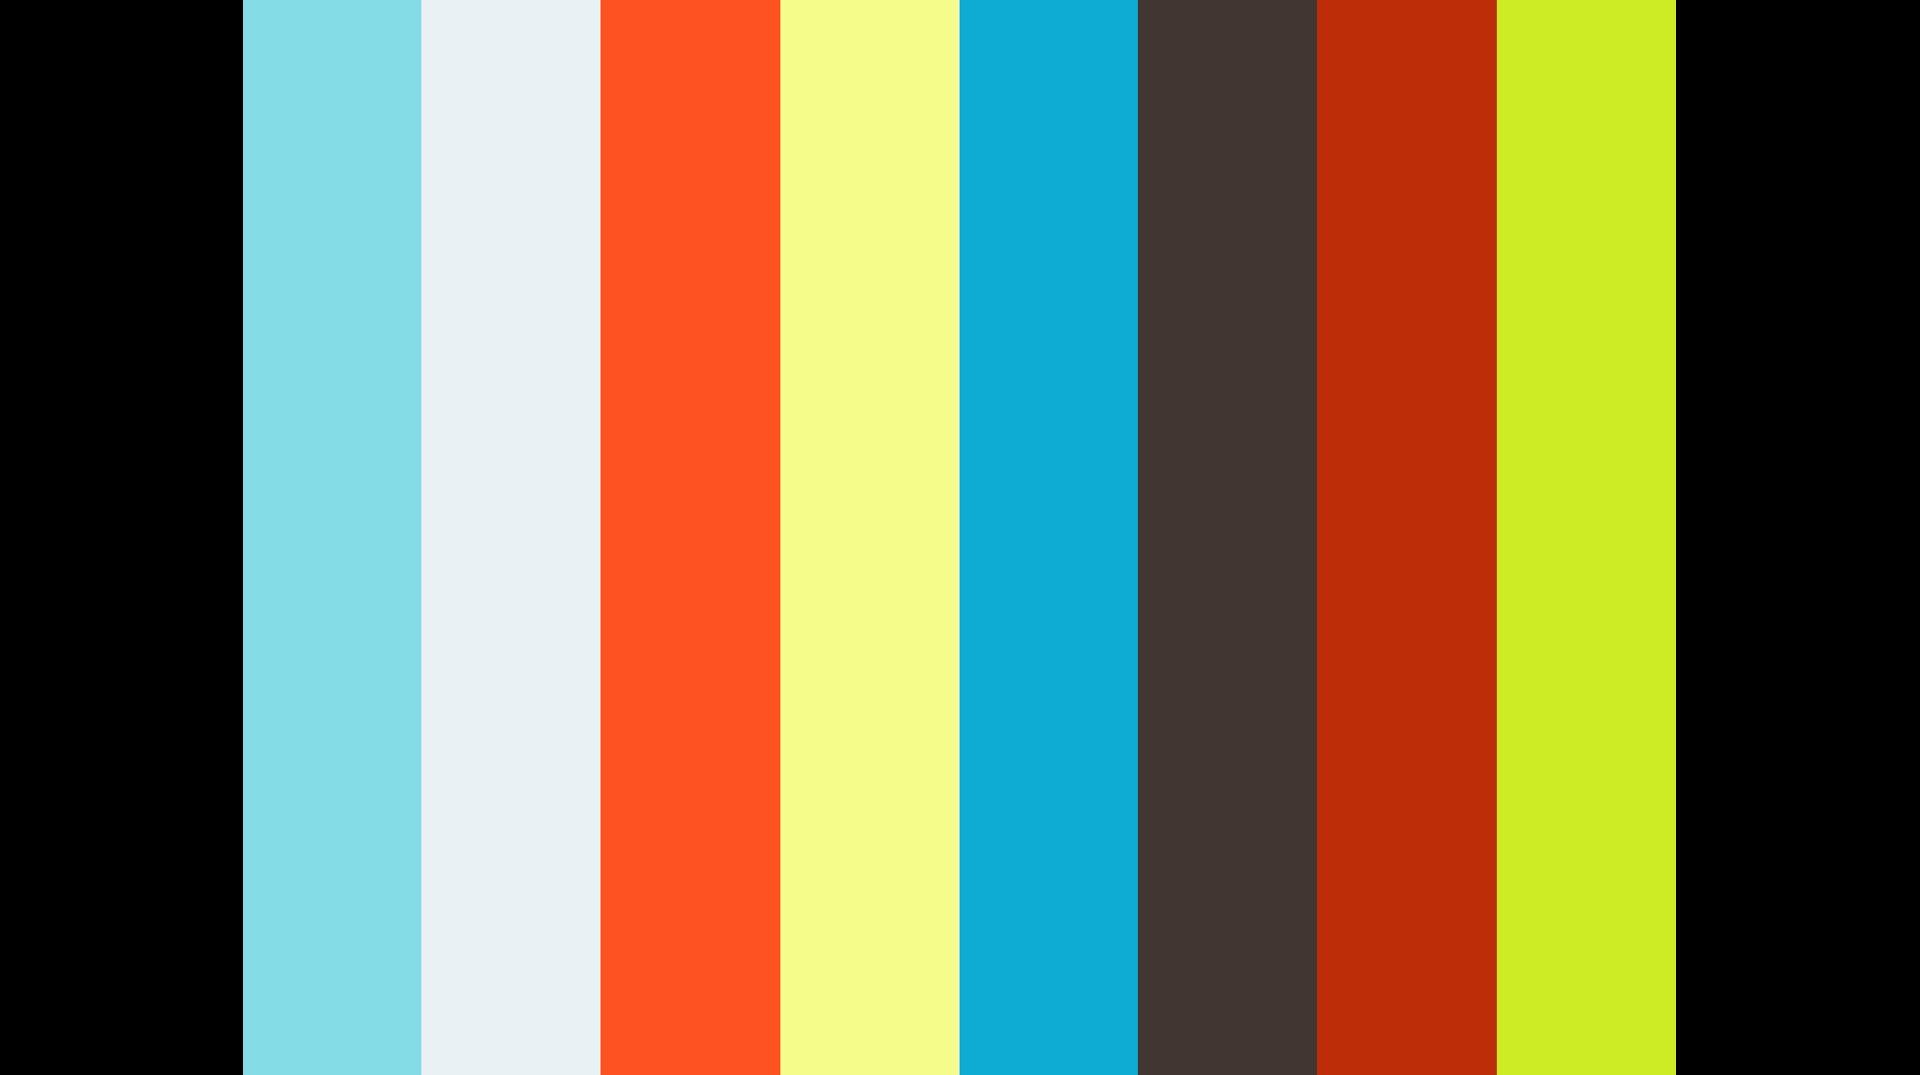 Alo, Ana səni sevirəm | Sosial Eksperiment